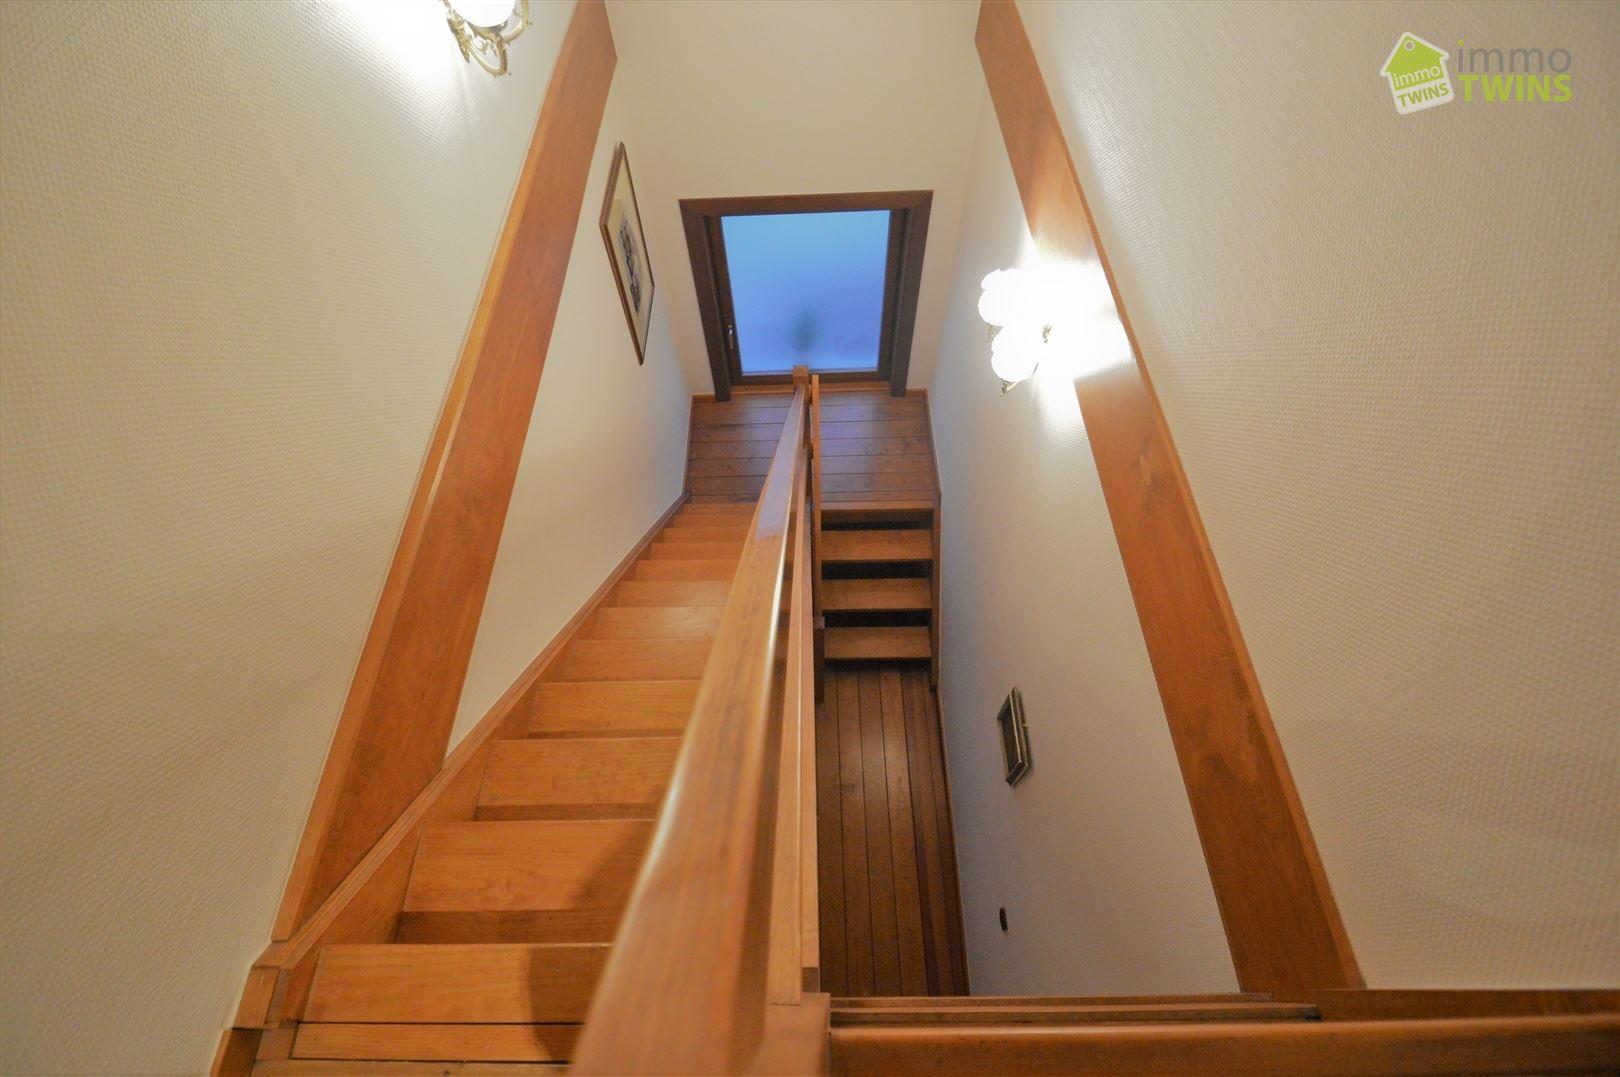 Foto 23 : Duplex/Penthouse te 2890 SINT-AMANDS (België) - Prijs € 429.000